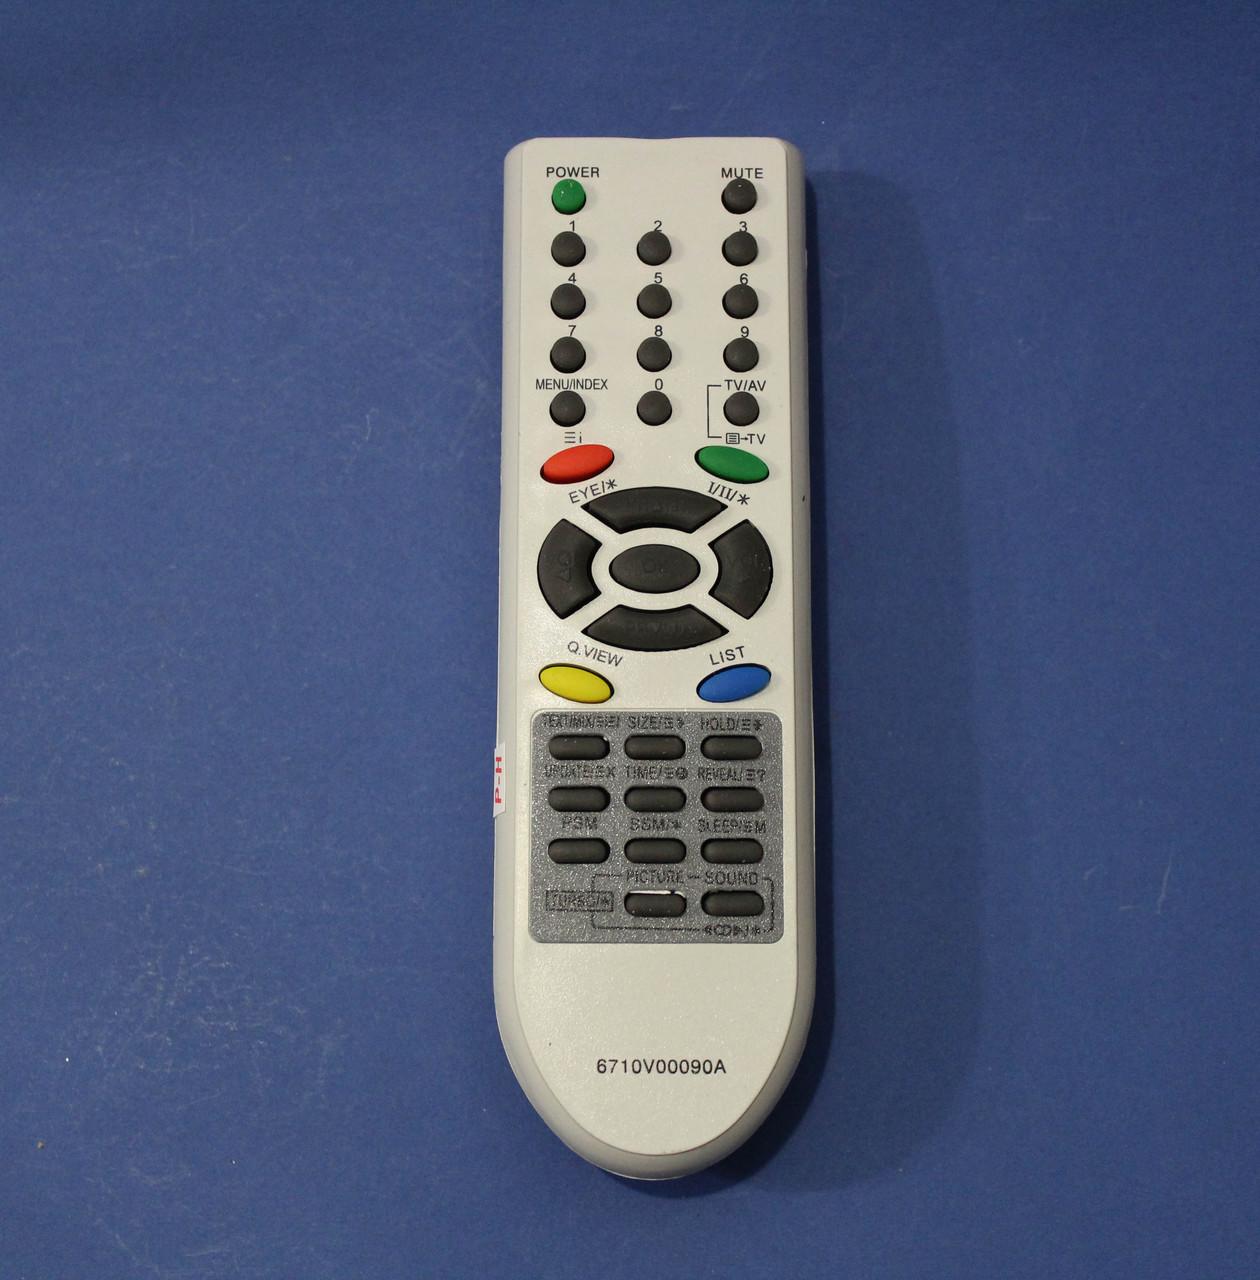 Пульт для телевизора lg 6710v00090a